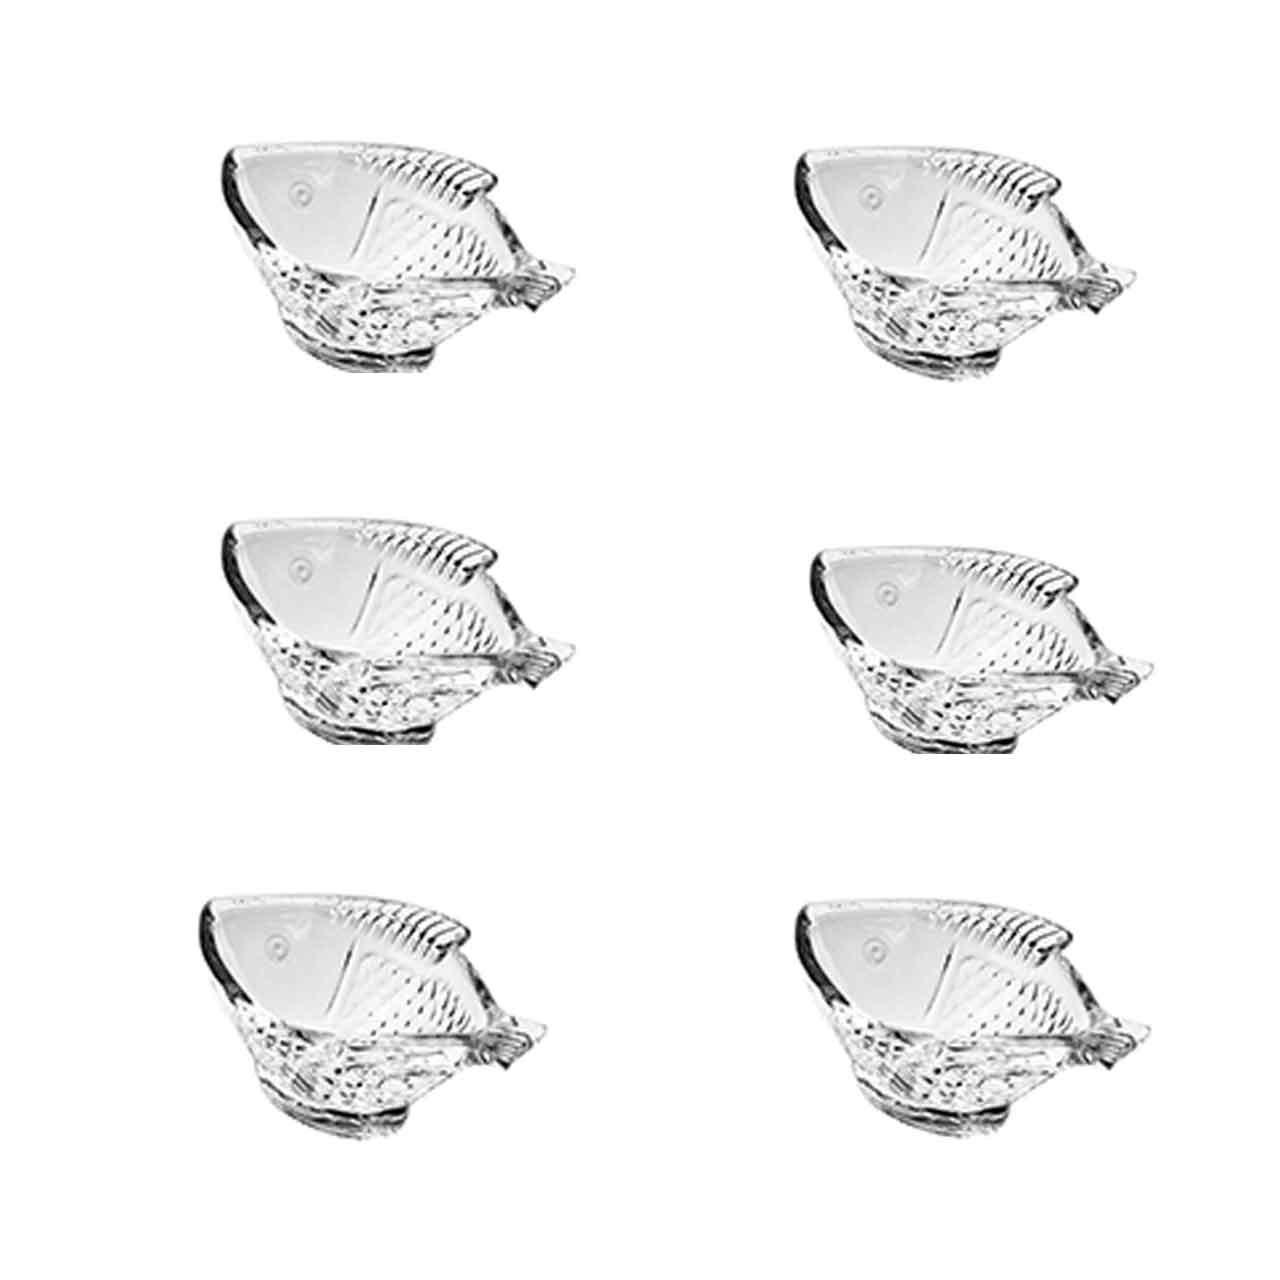 عکس پیاله بلور کاوه مدل Fiterfish بسته 6 عددی